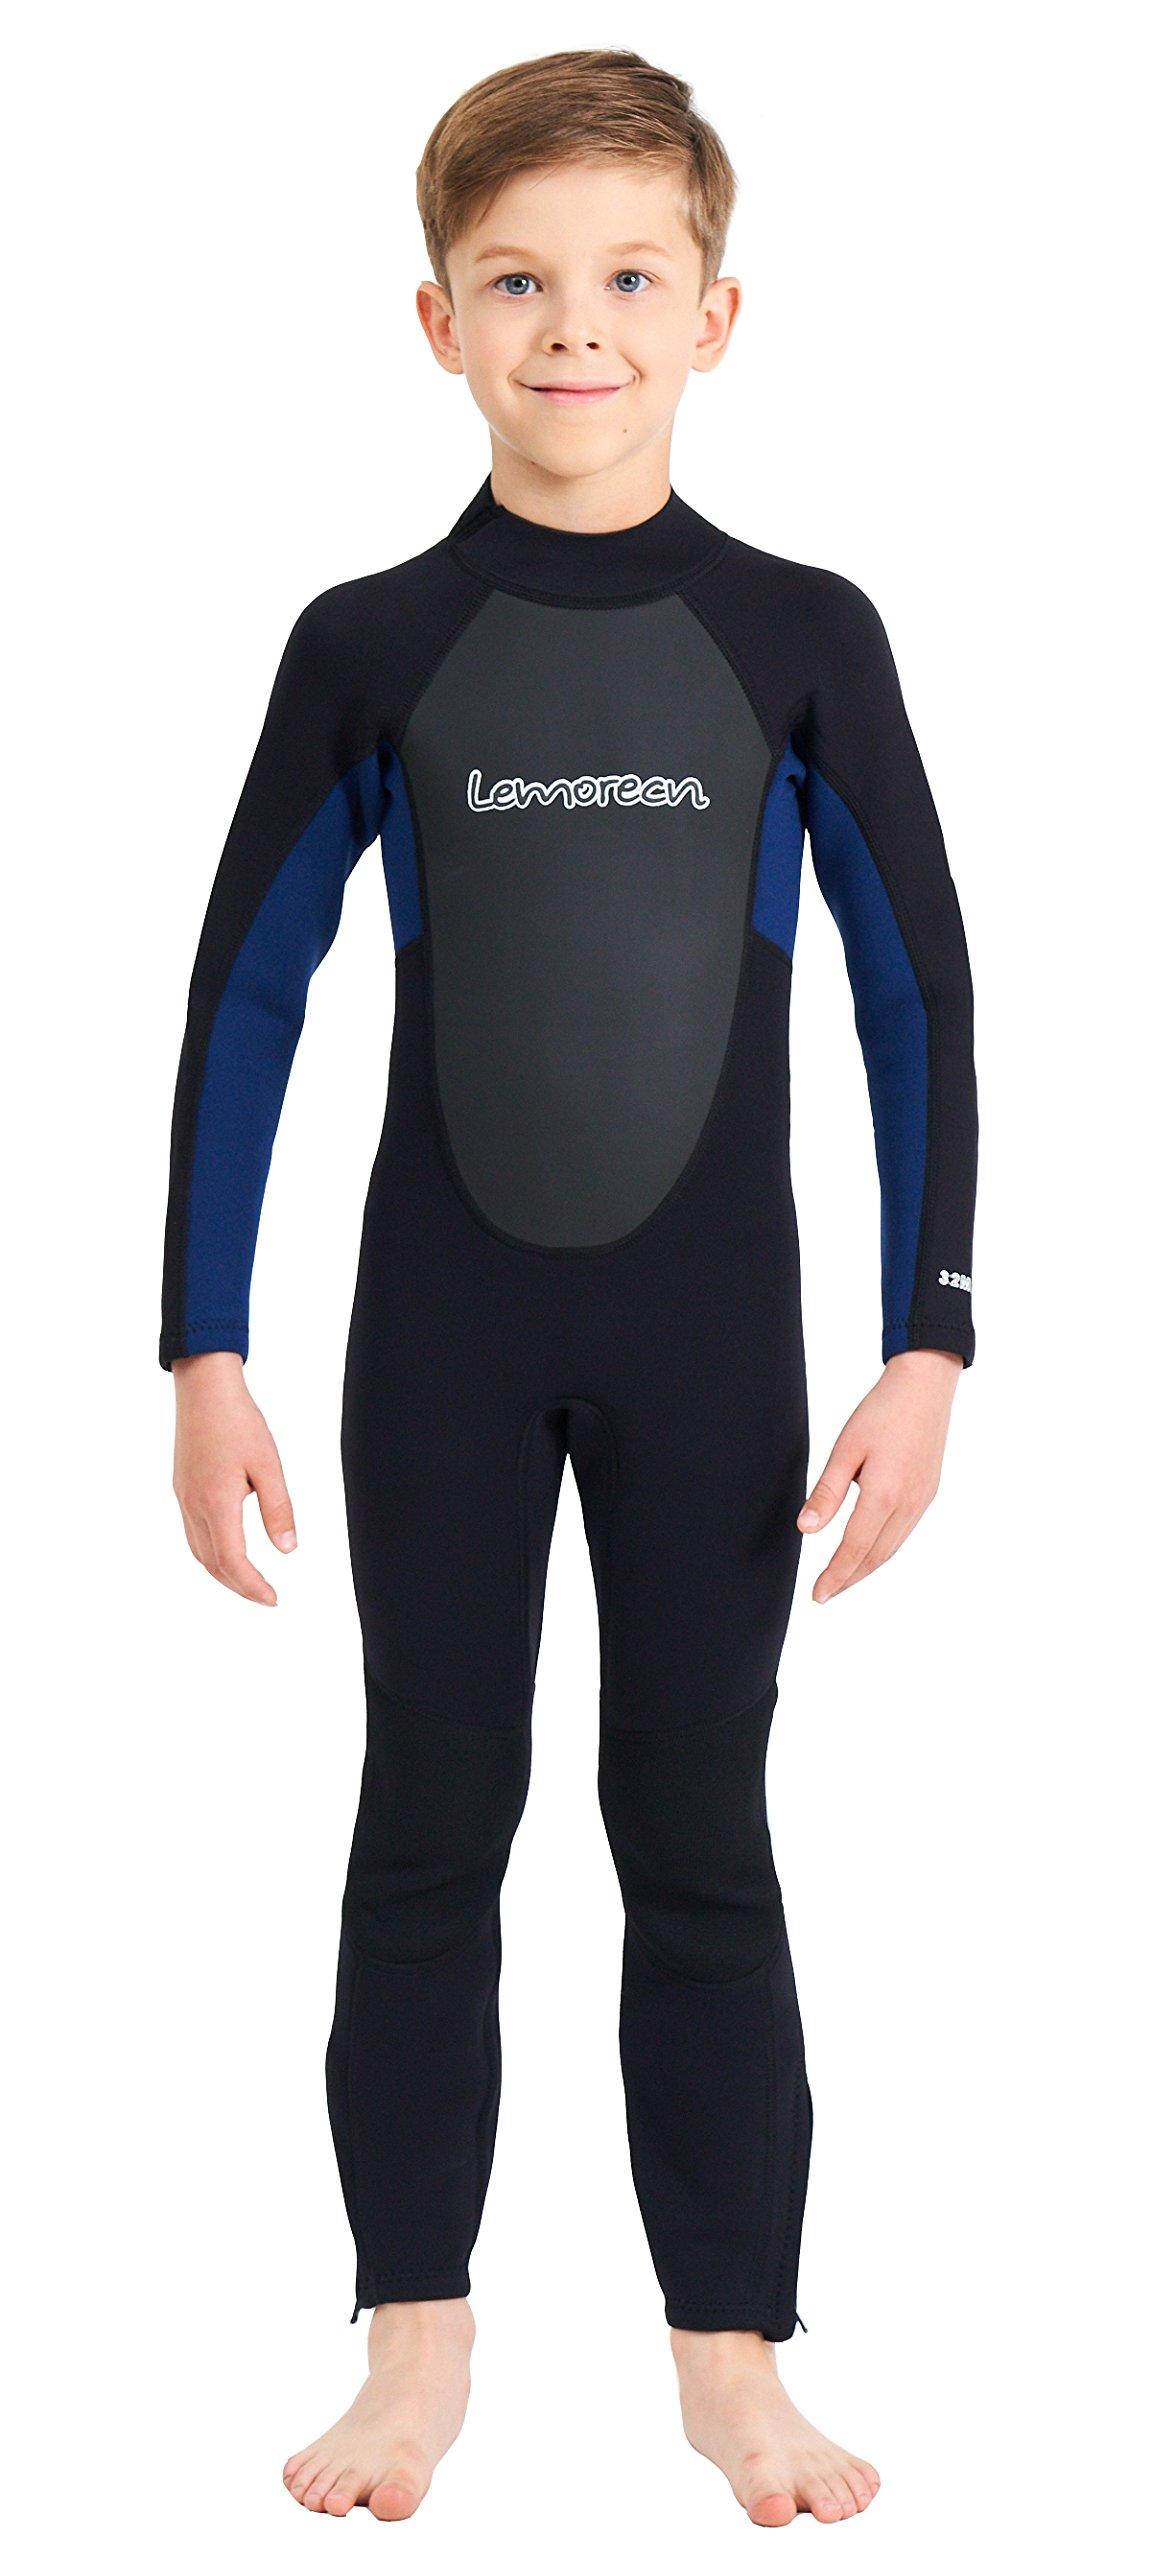 Lemorecn Wetsuits Youth 3/2 mm Full Diving Suit(4031blackblue6)